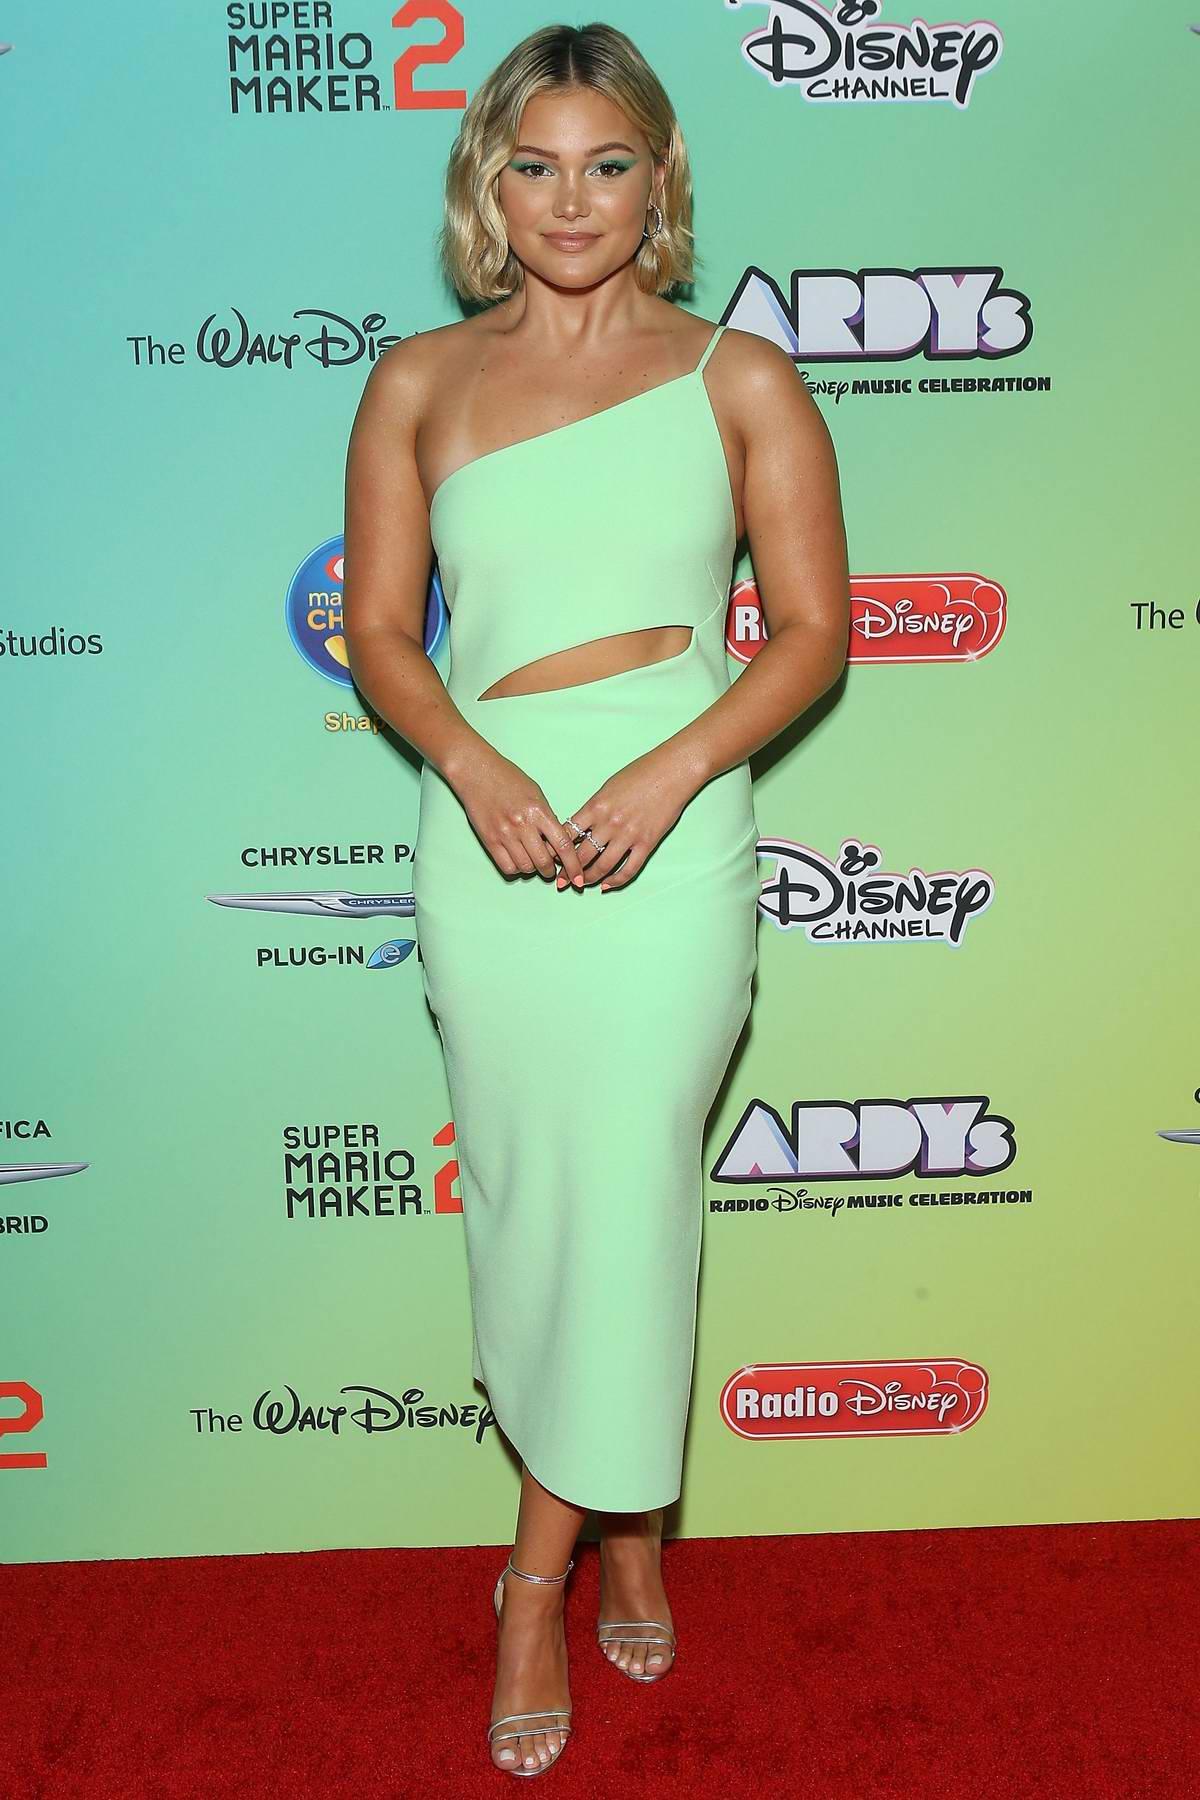 Olivia Holt attends the 2019 Radio Disney Music Awards (ARDYs 2019) at the CBS Radford Studios in Studio City, California